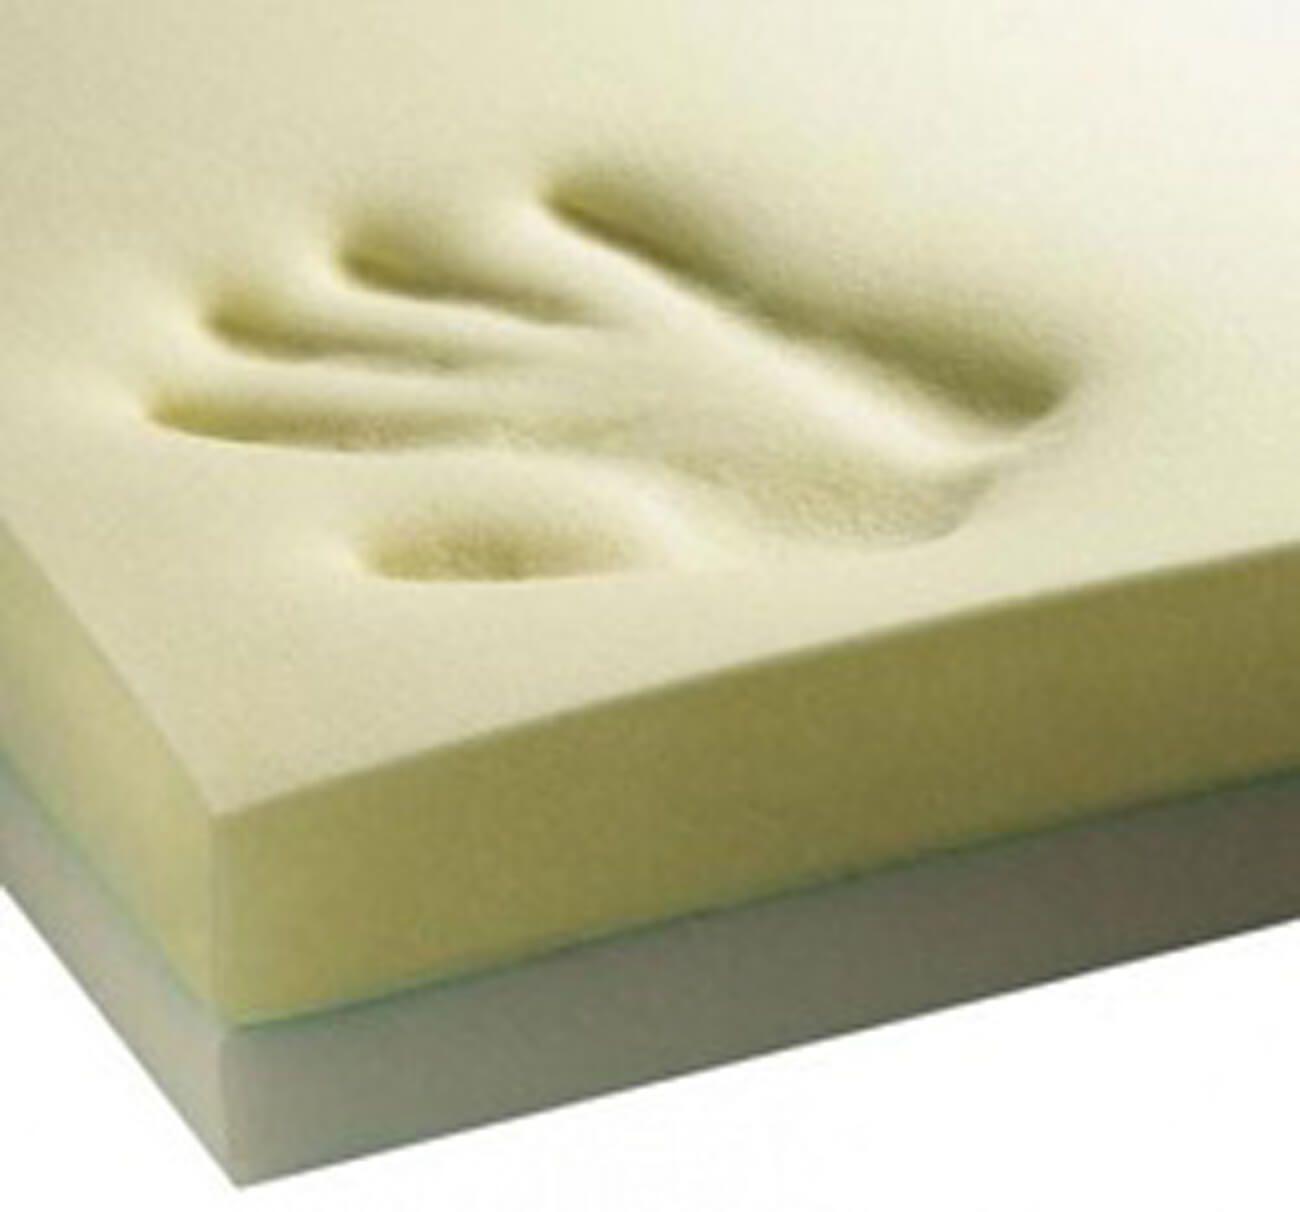 Pilow Top Visco Elastico Casal 1,38x1,88x5,0cm  - Kenko Premium Colchões